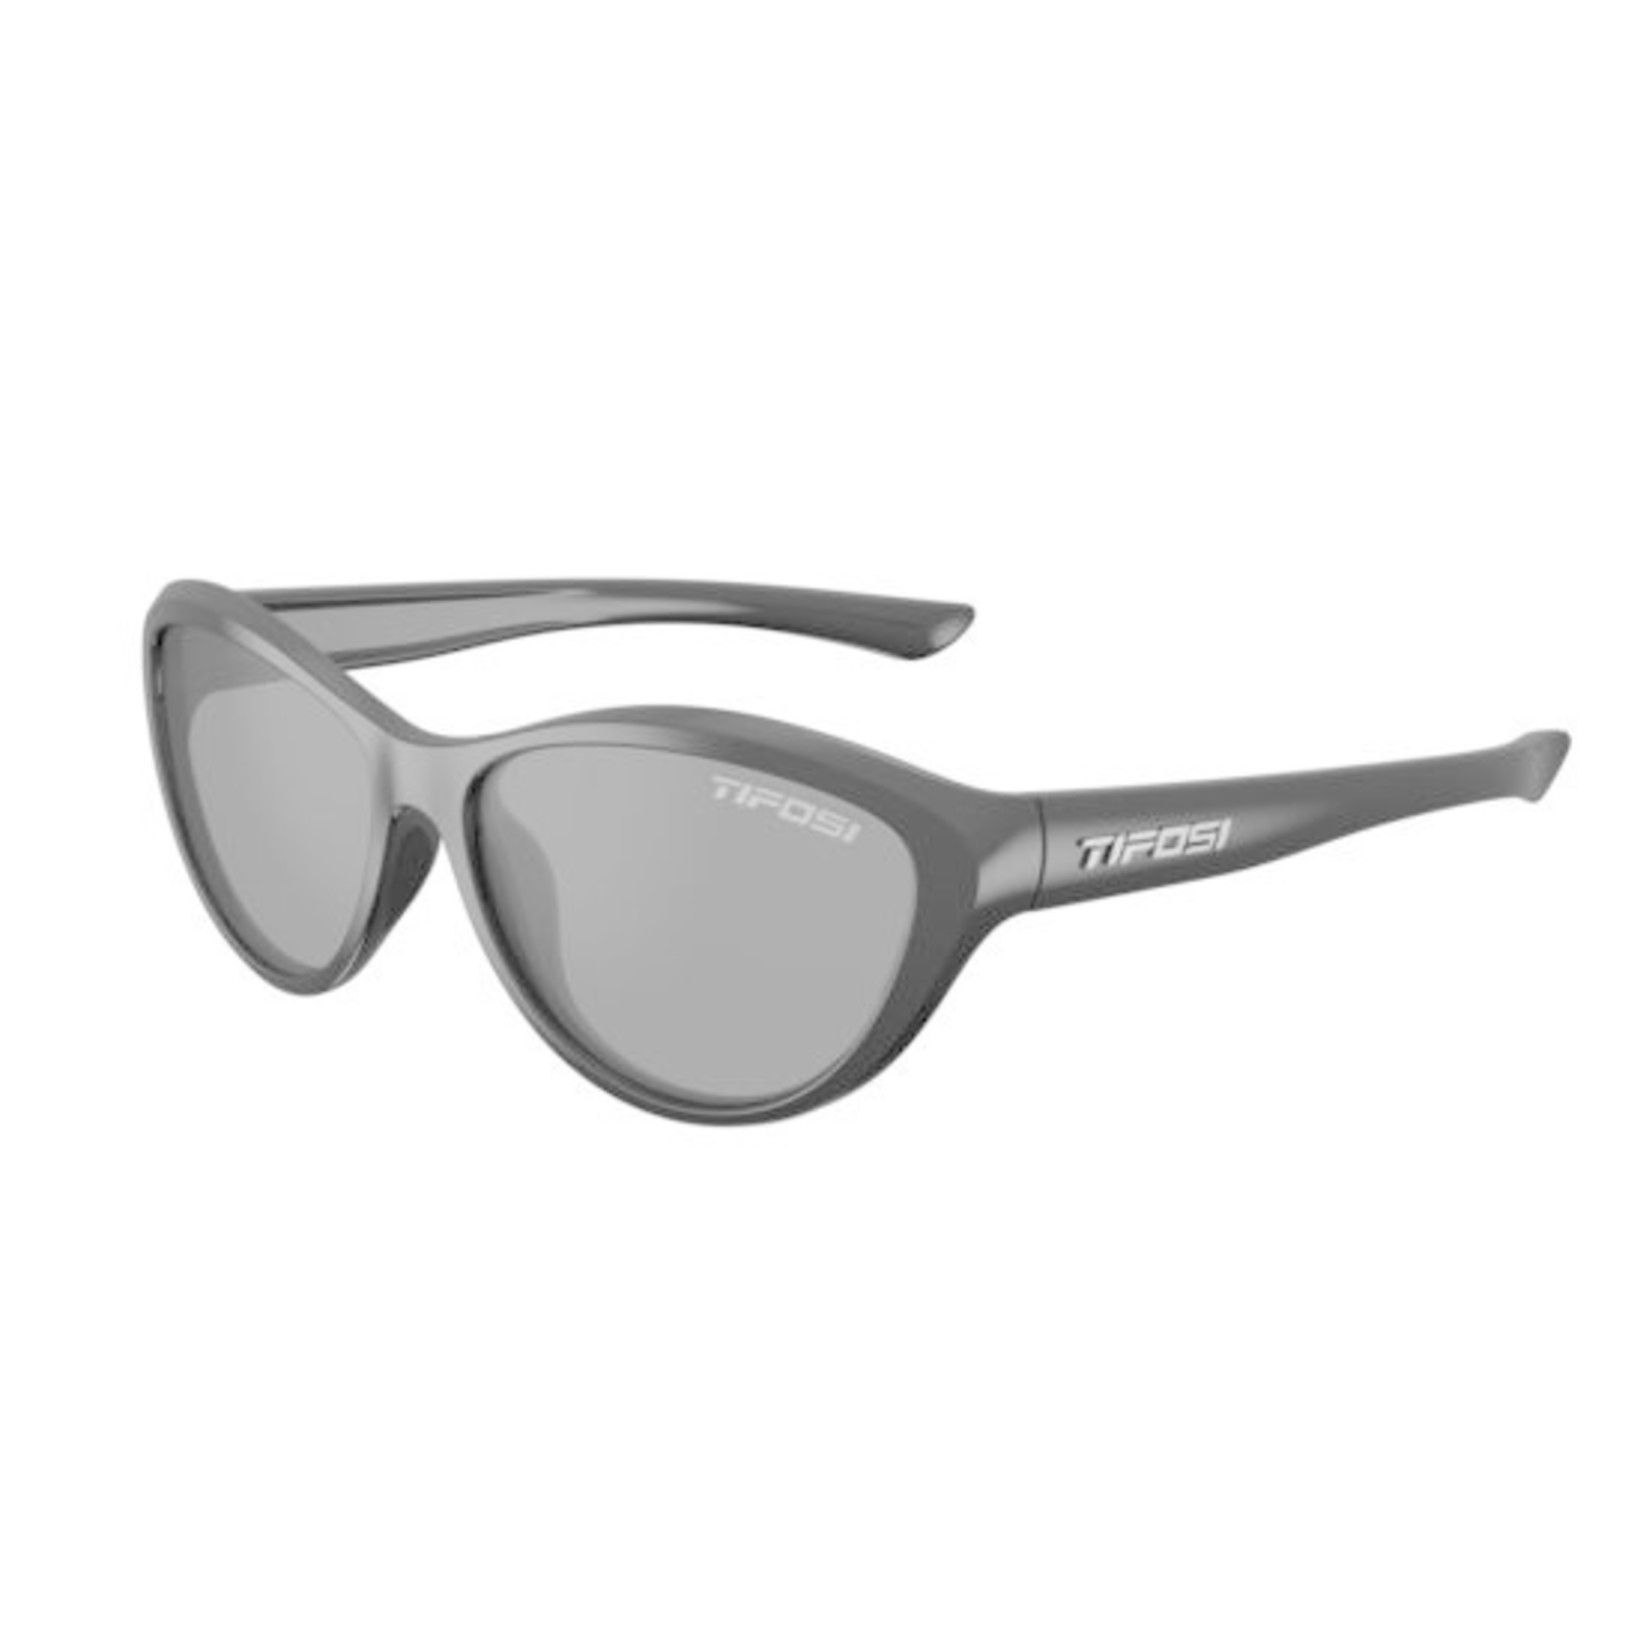 Tifosi Optics Shirley, Gloss Black Single Lens Sunglasses